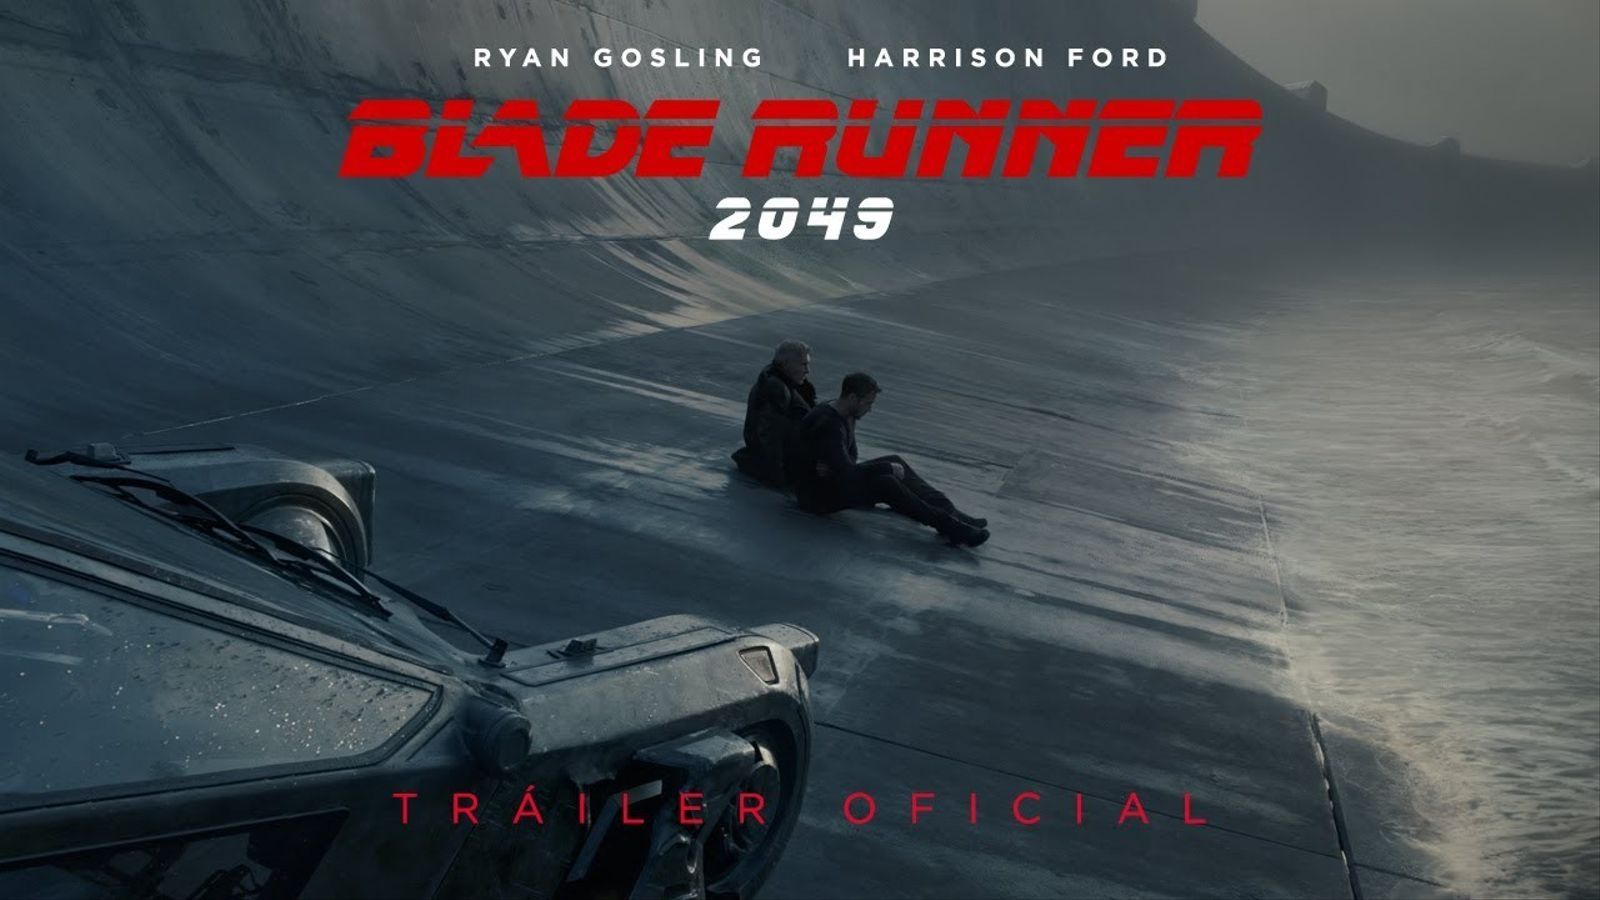 Arriba el tràiler oficial de 'Blade Runner 2049'